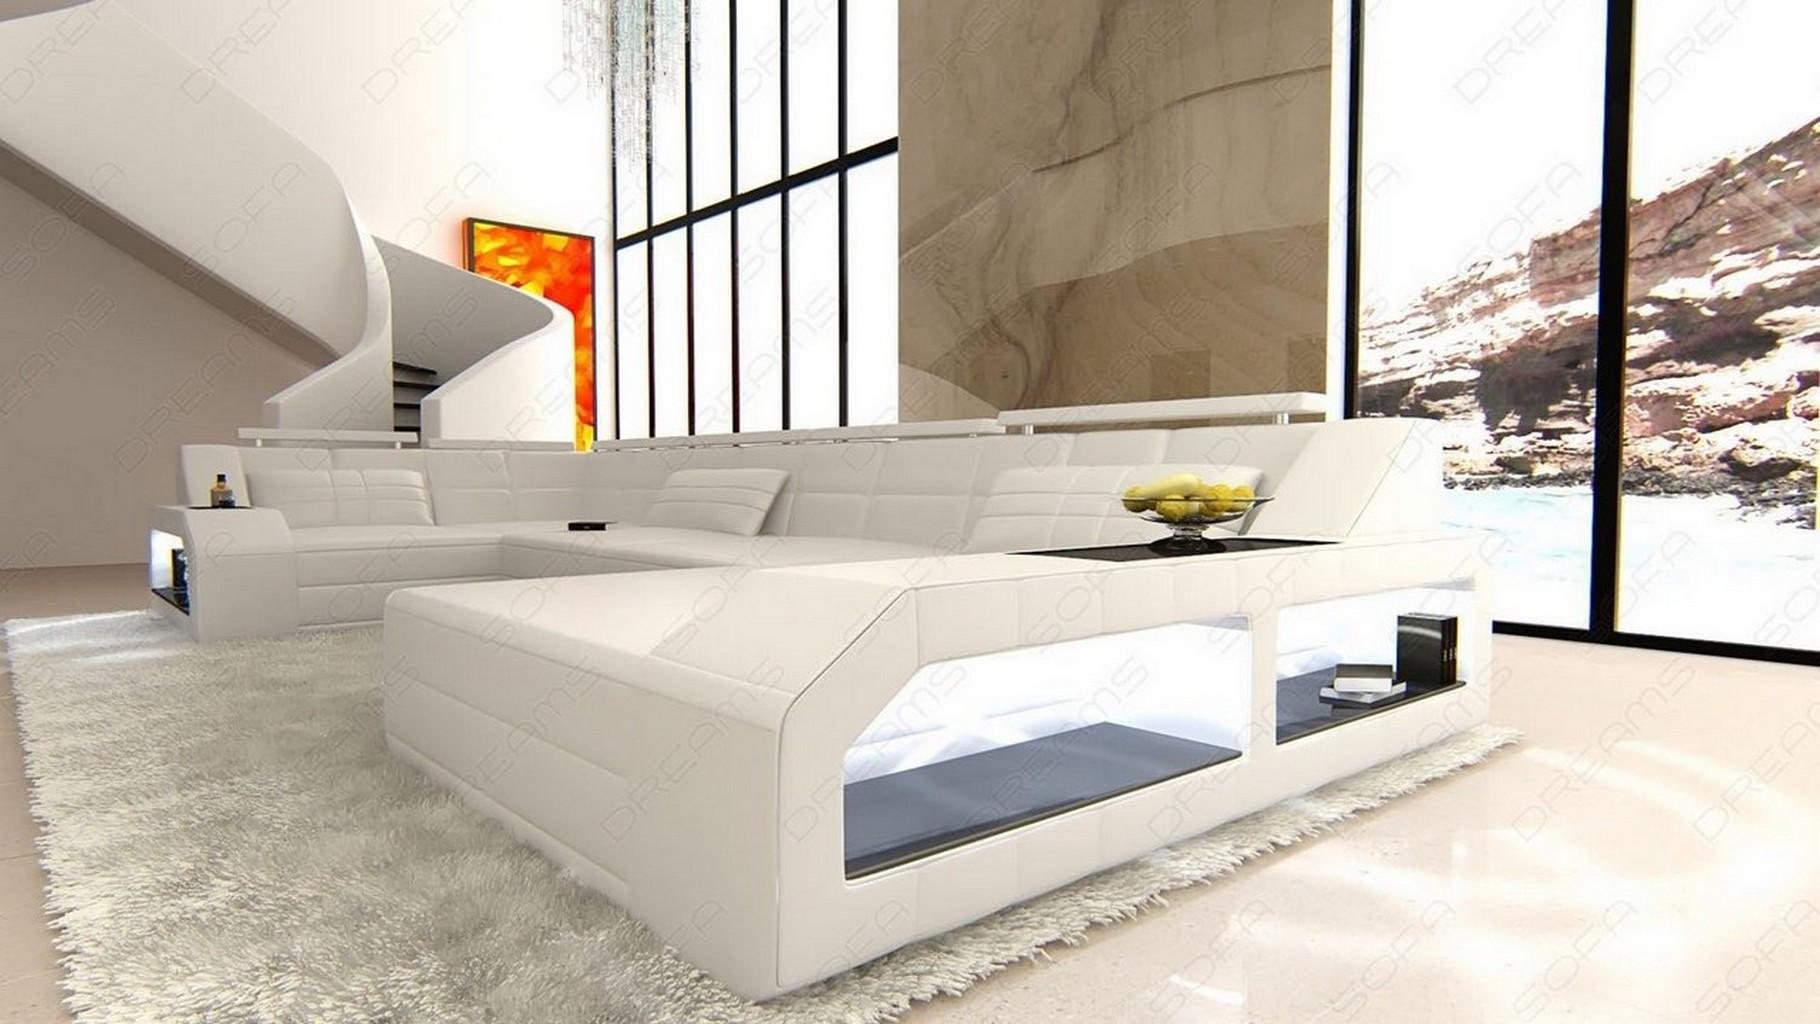 sofa wohnlandschaft leder designer couch arezzo u form ecksofa beleuchtung weiss ebay. Black Bedroom Furniture Sets. Home Design Ideas